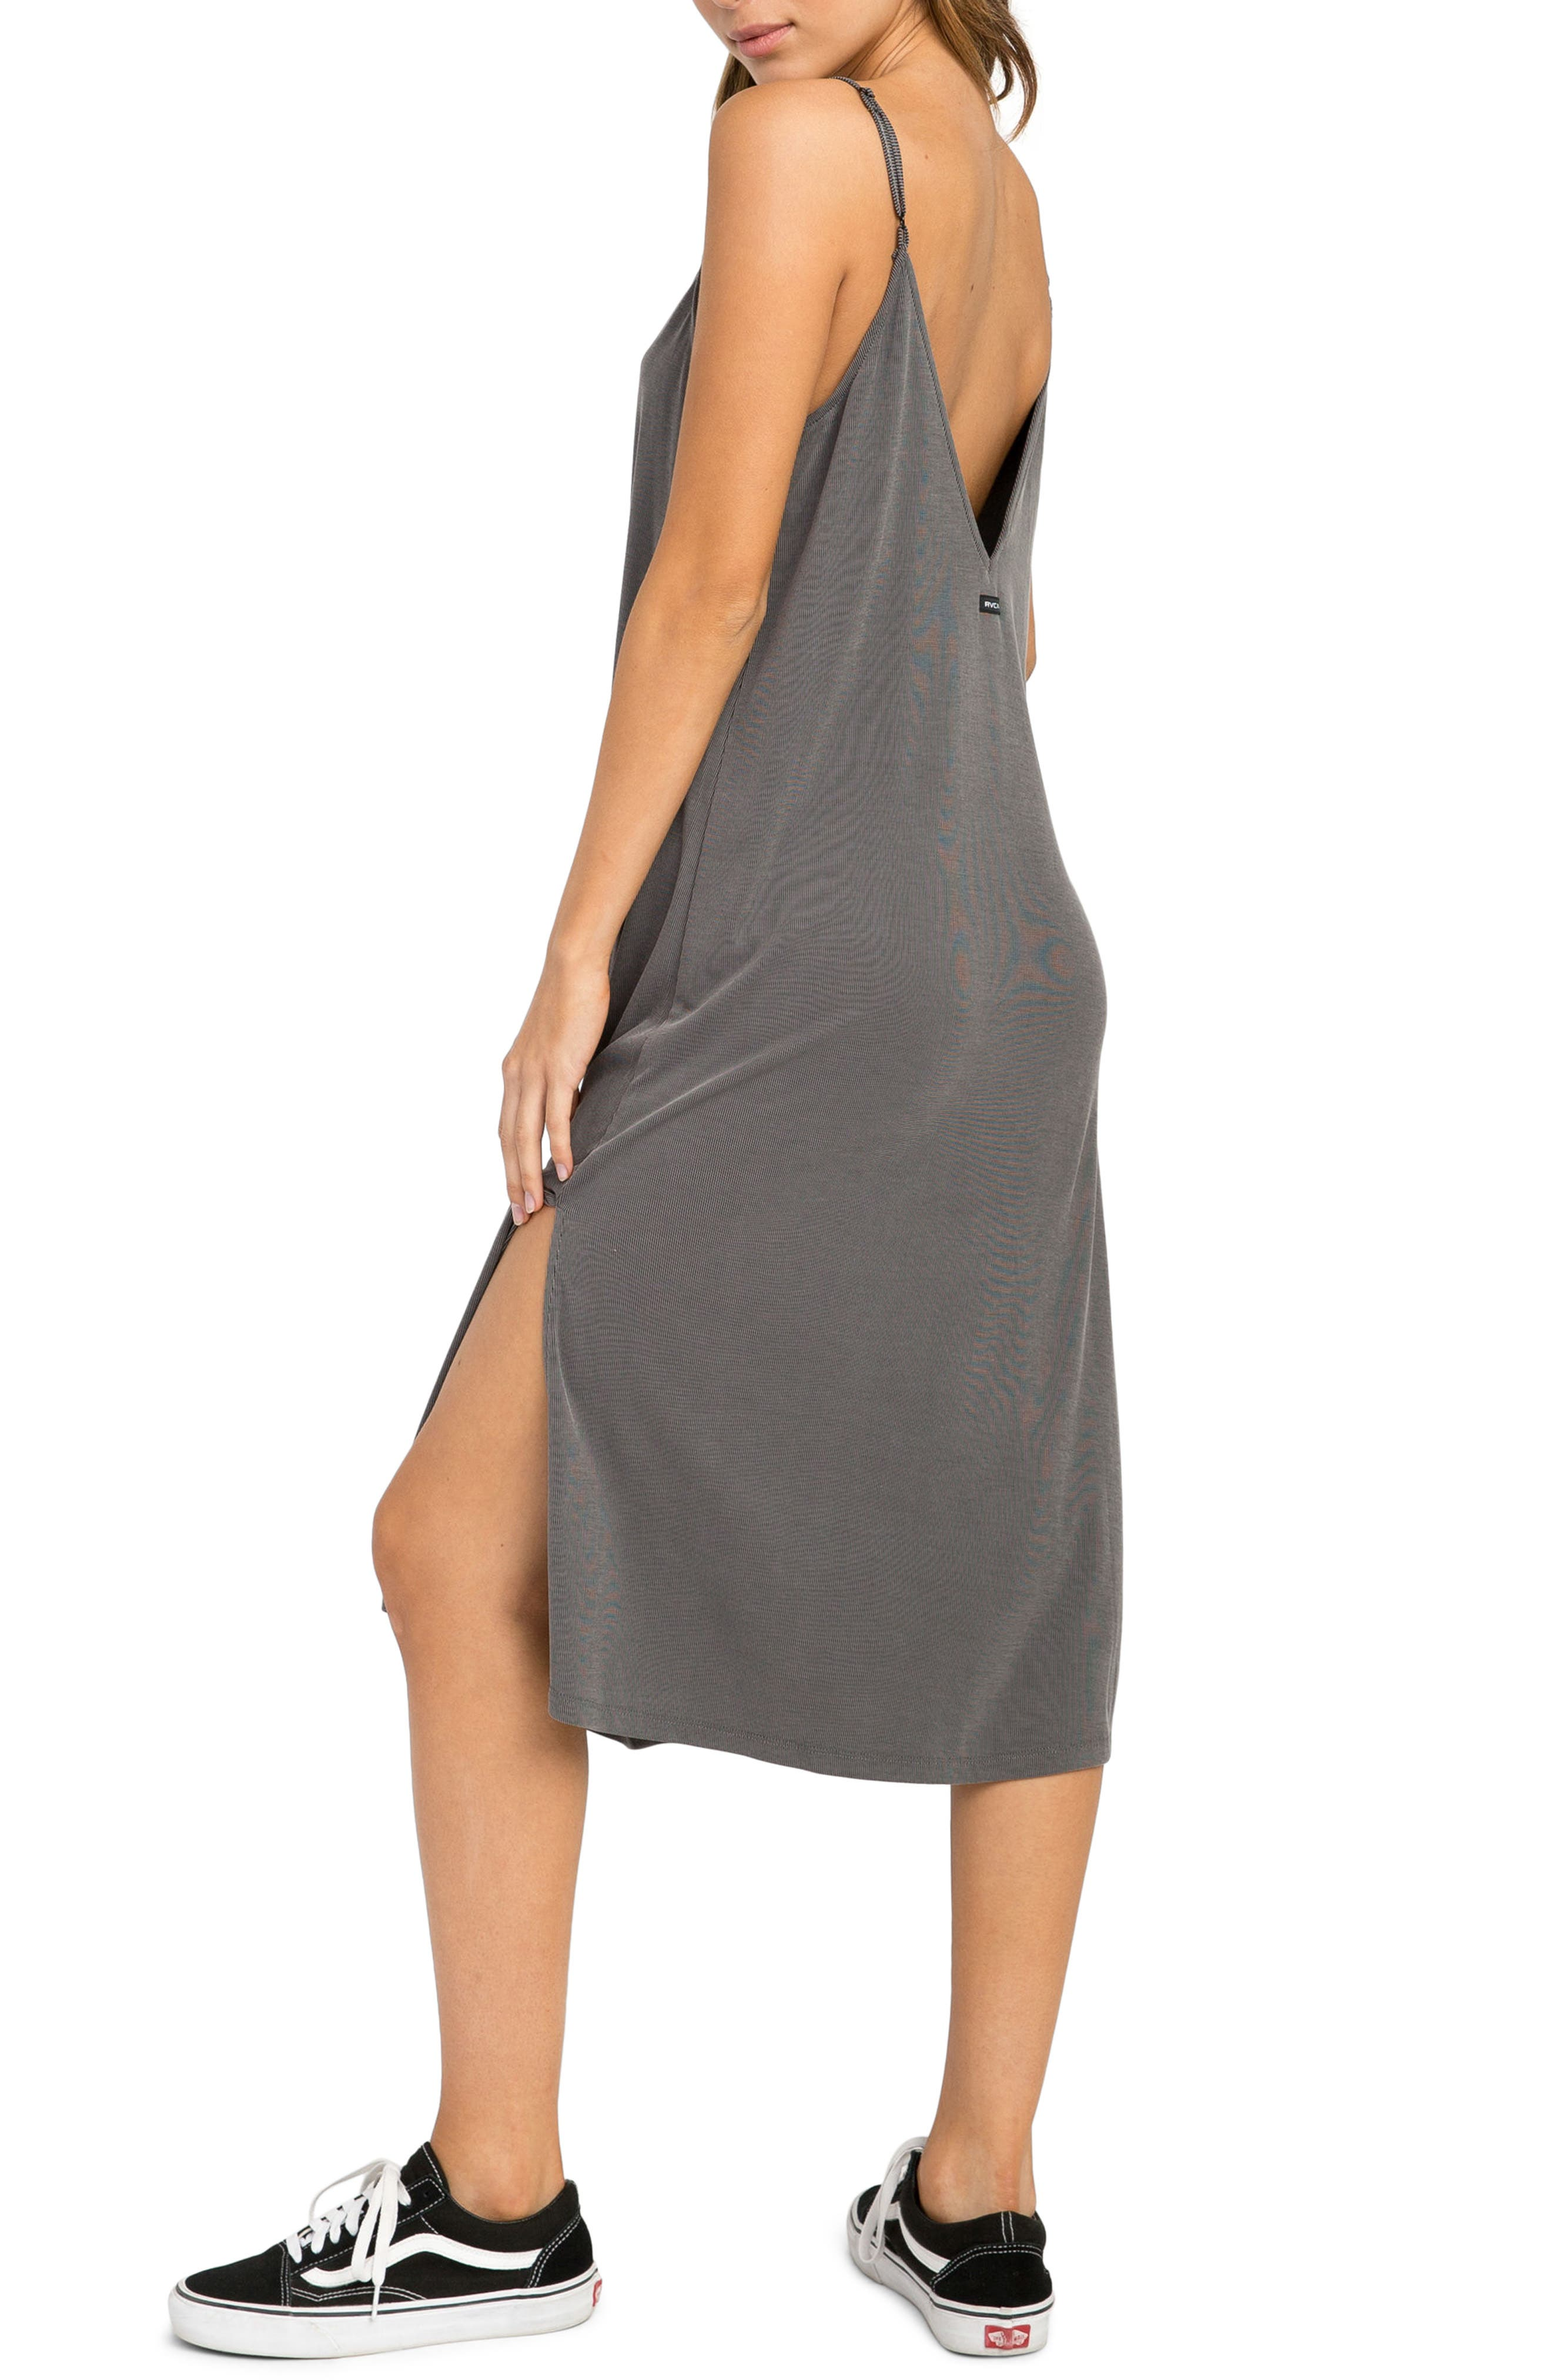 Jones Midi Dress,                             Alternate thumbnail 3, color,                             Grey